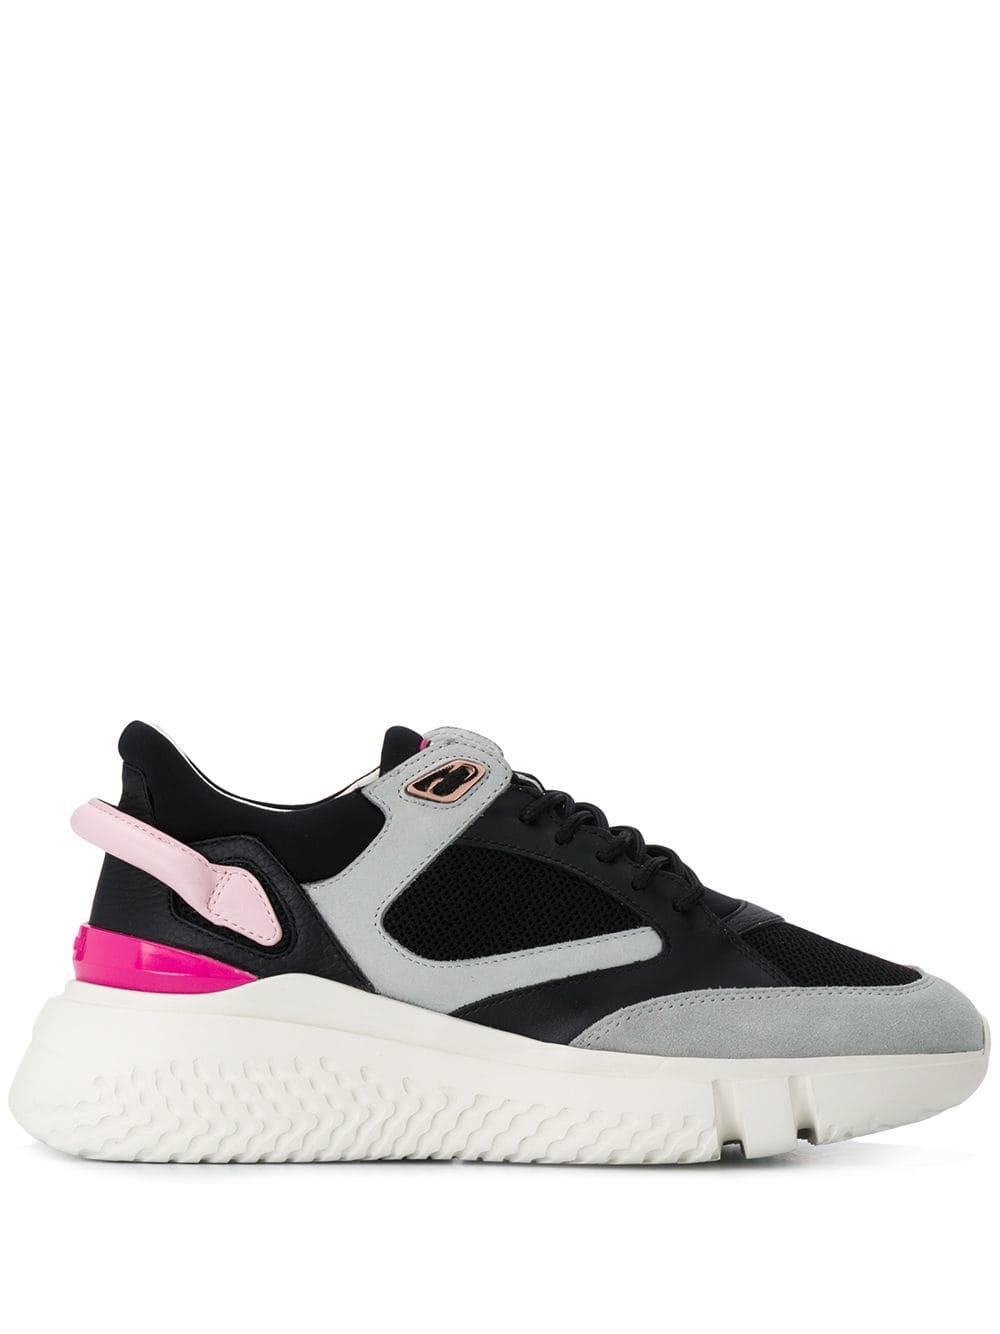 Buscemi Chunky sneakers - Zwart